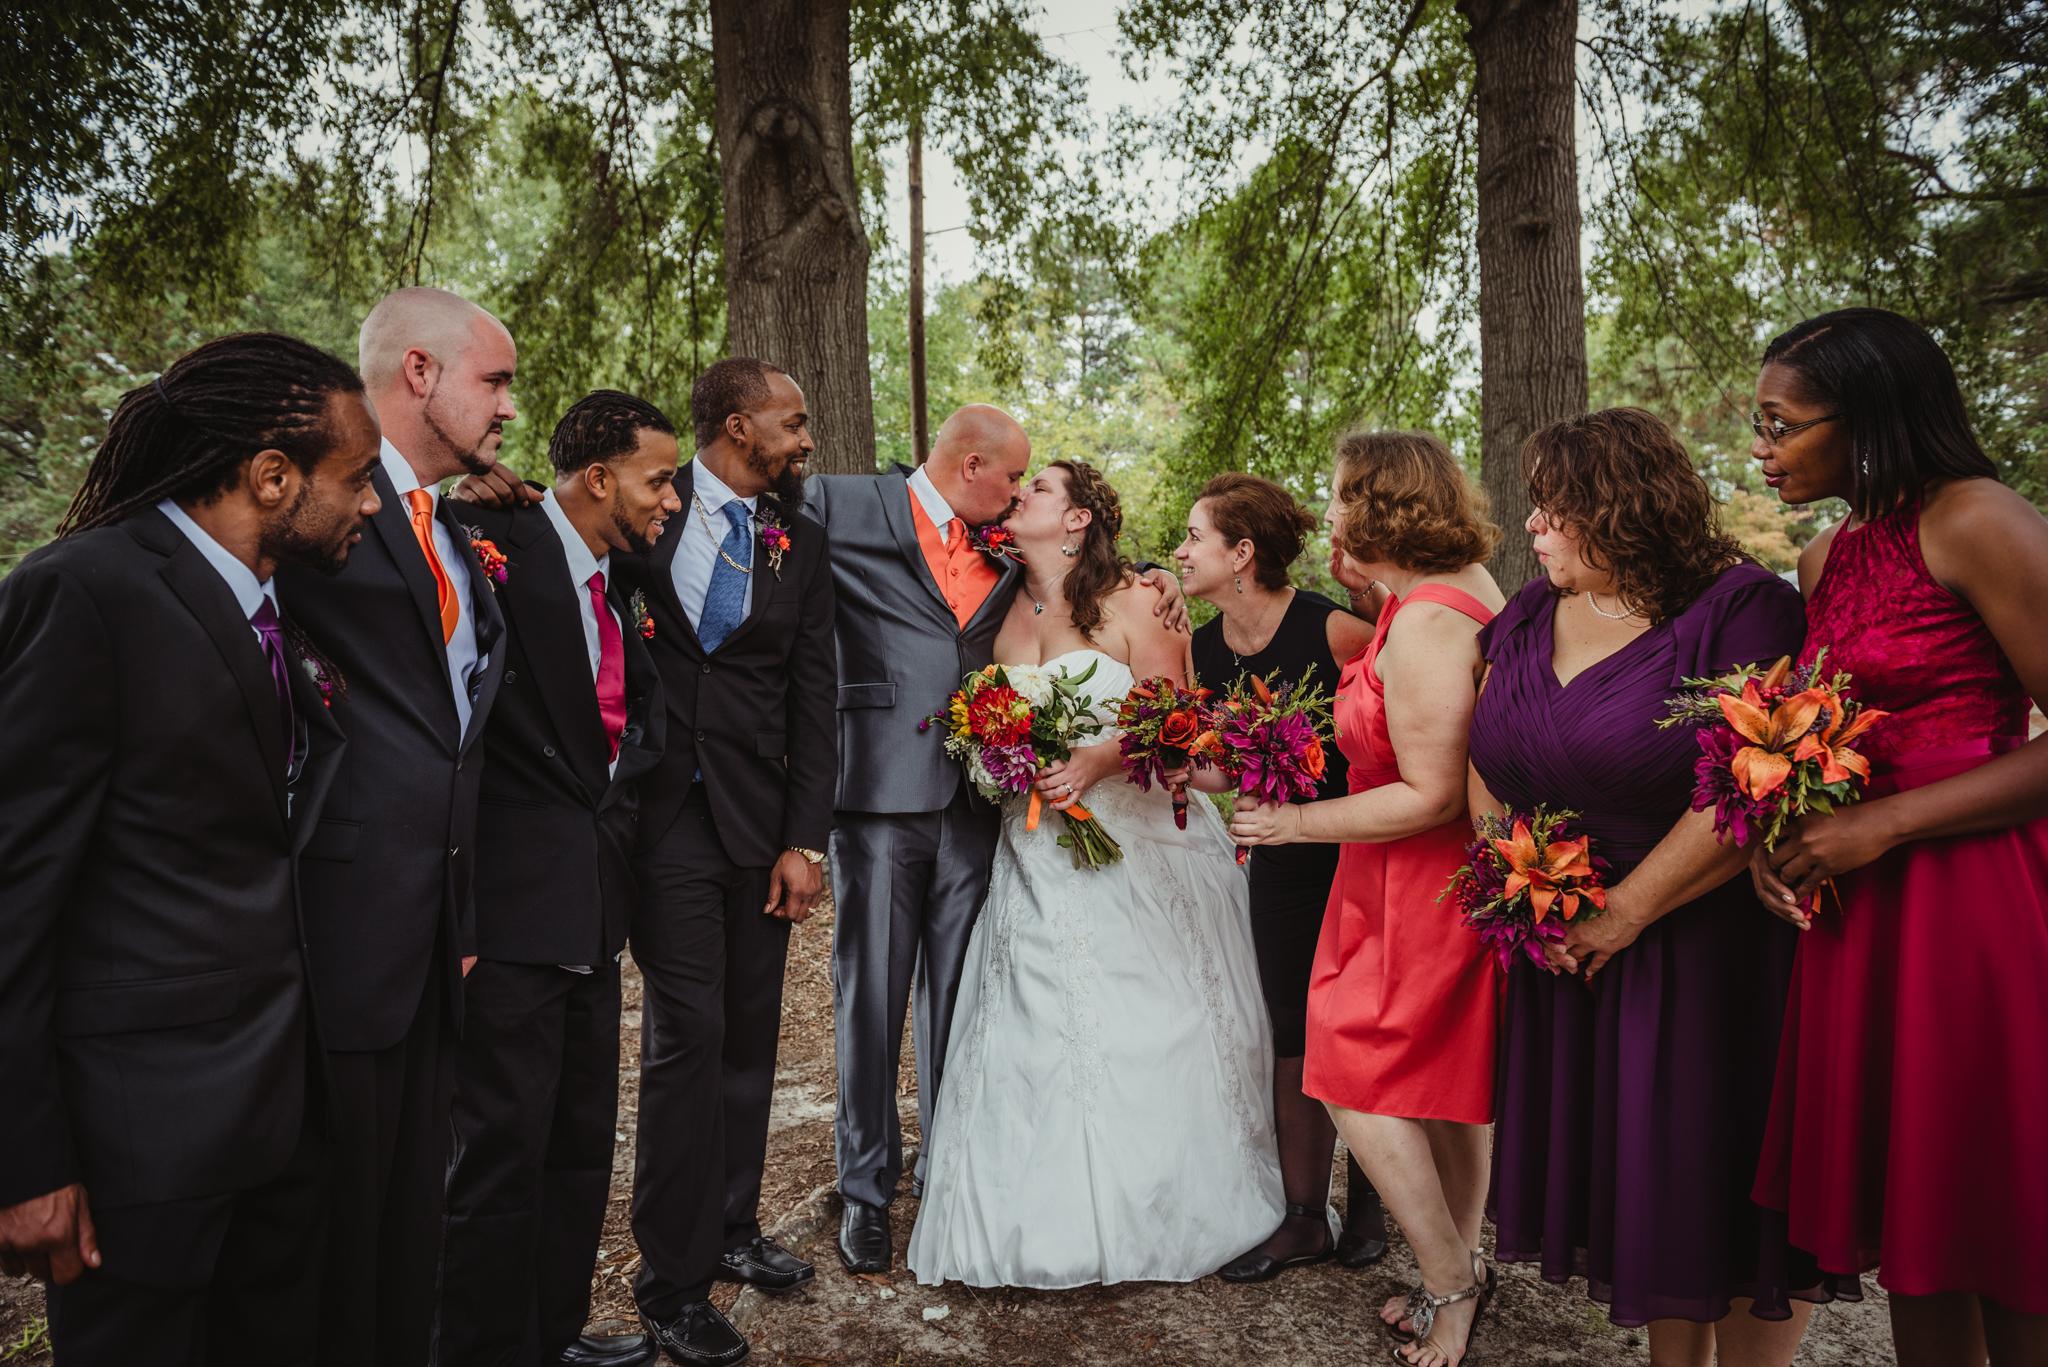 raleigh-wedding-bridal-party-portraits-cd-2.jpg